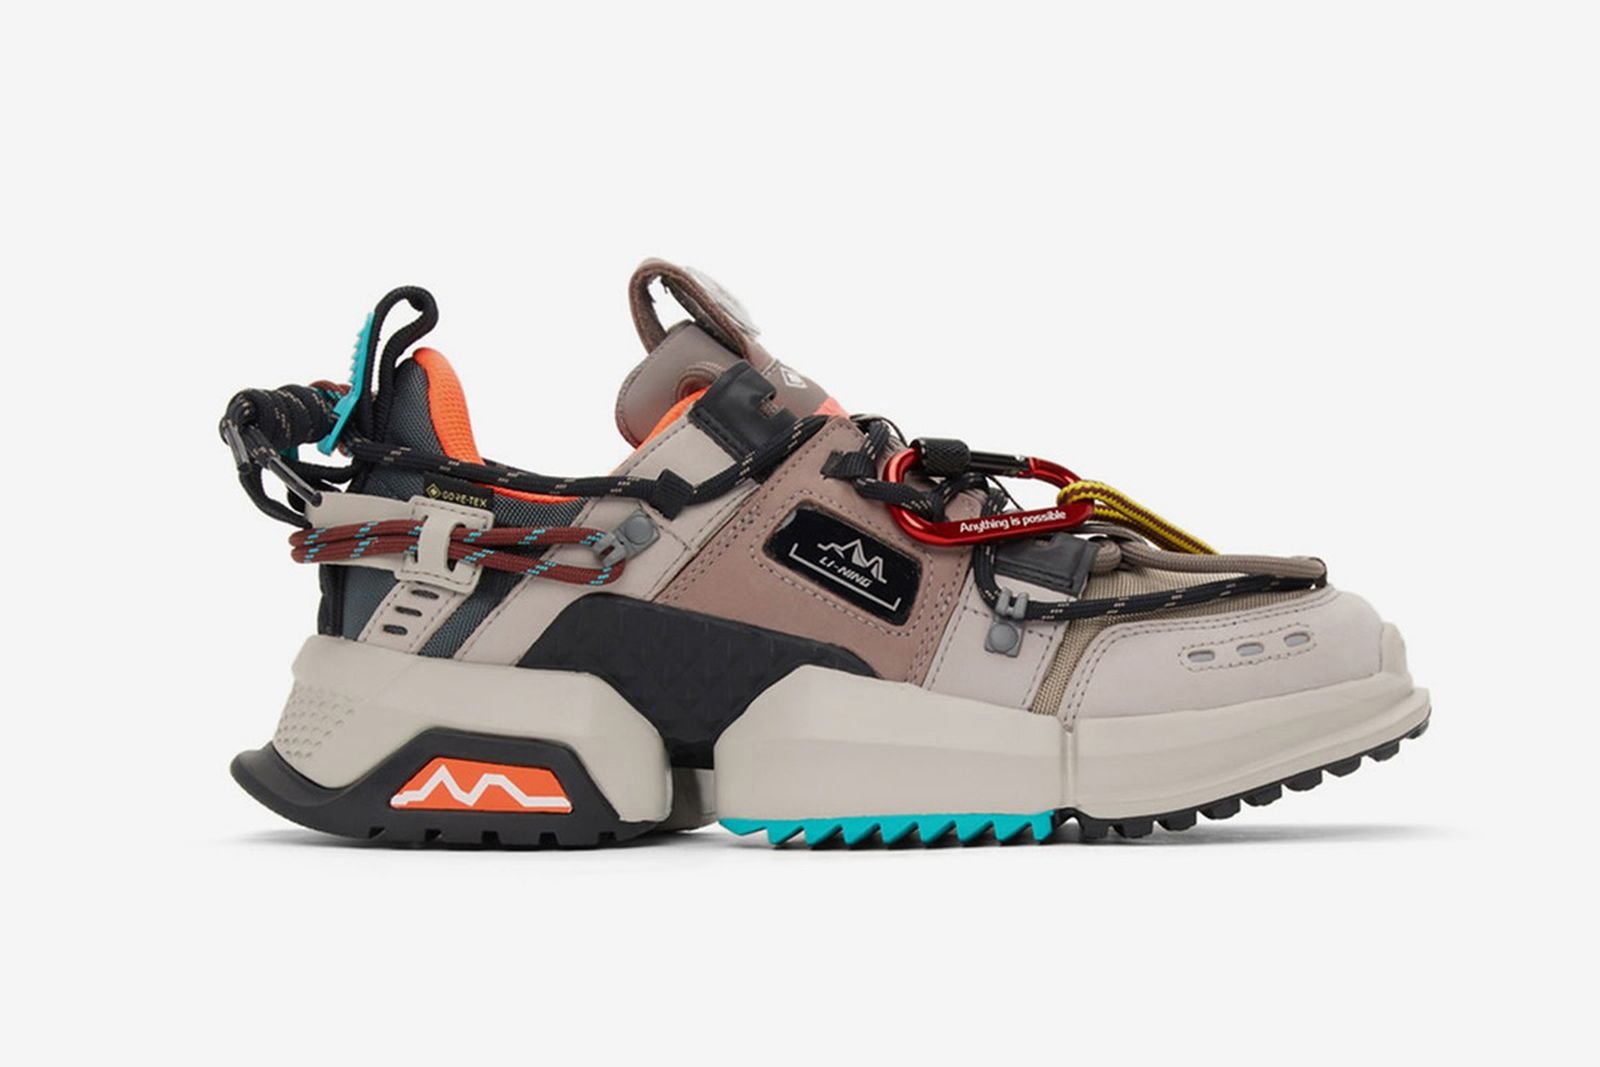 futuristic sneakers